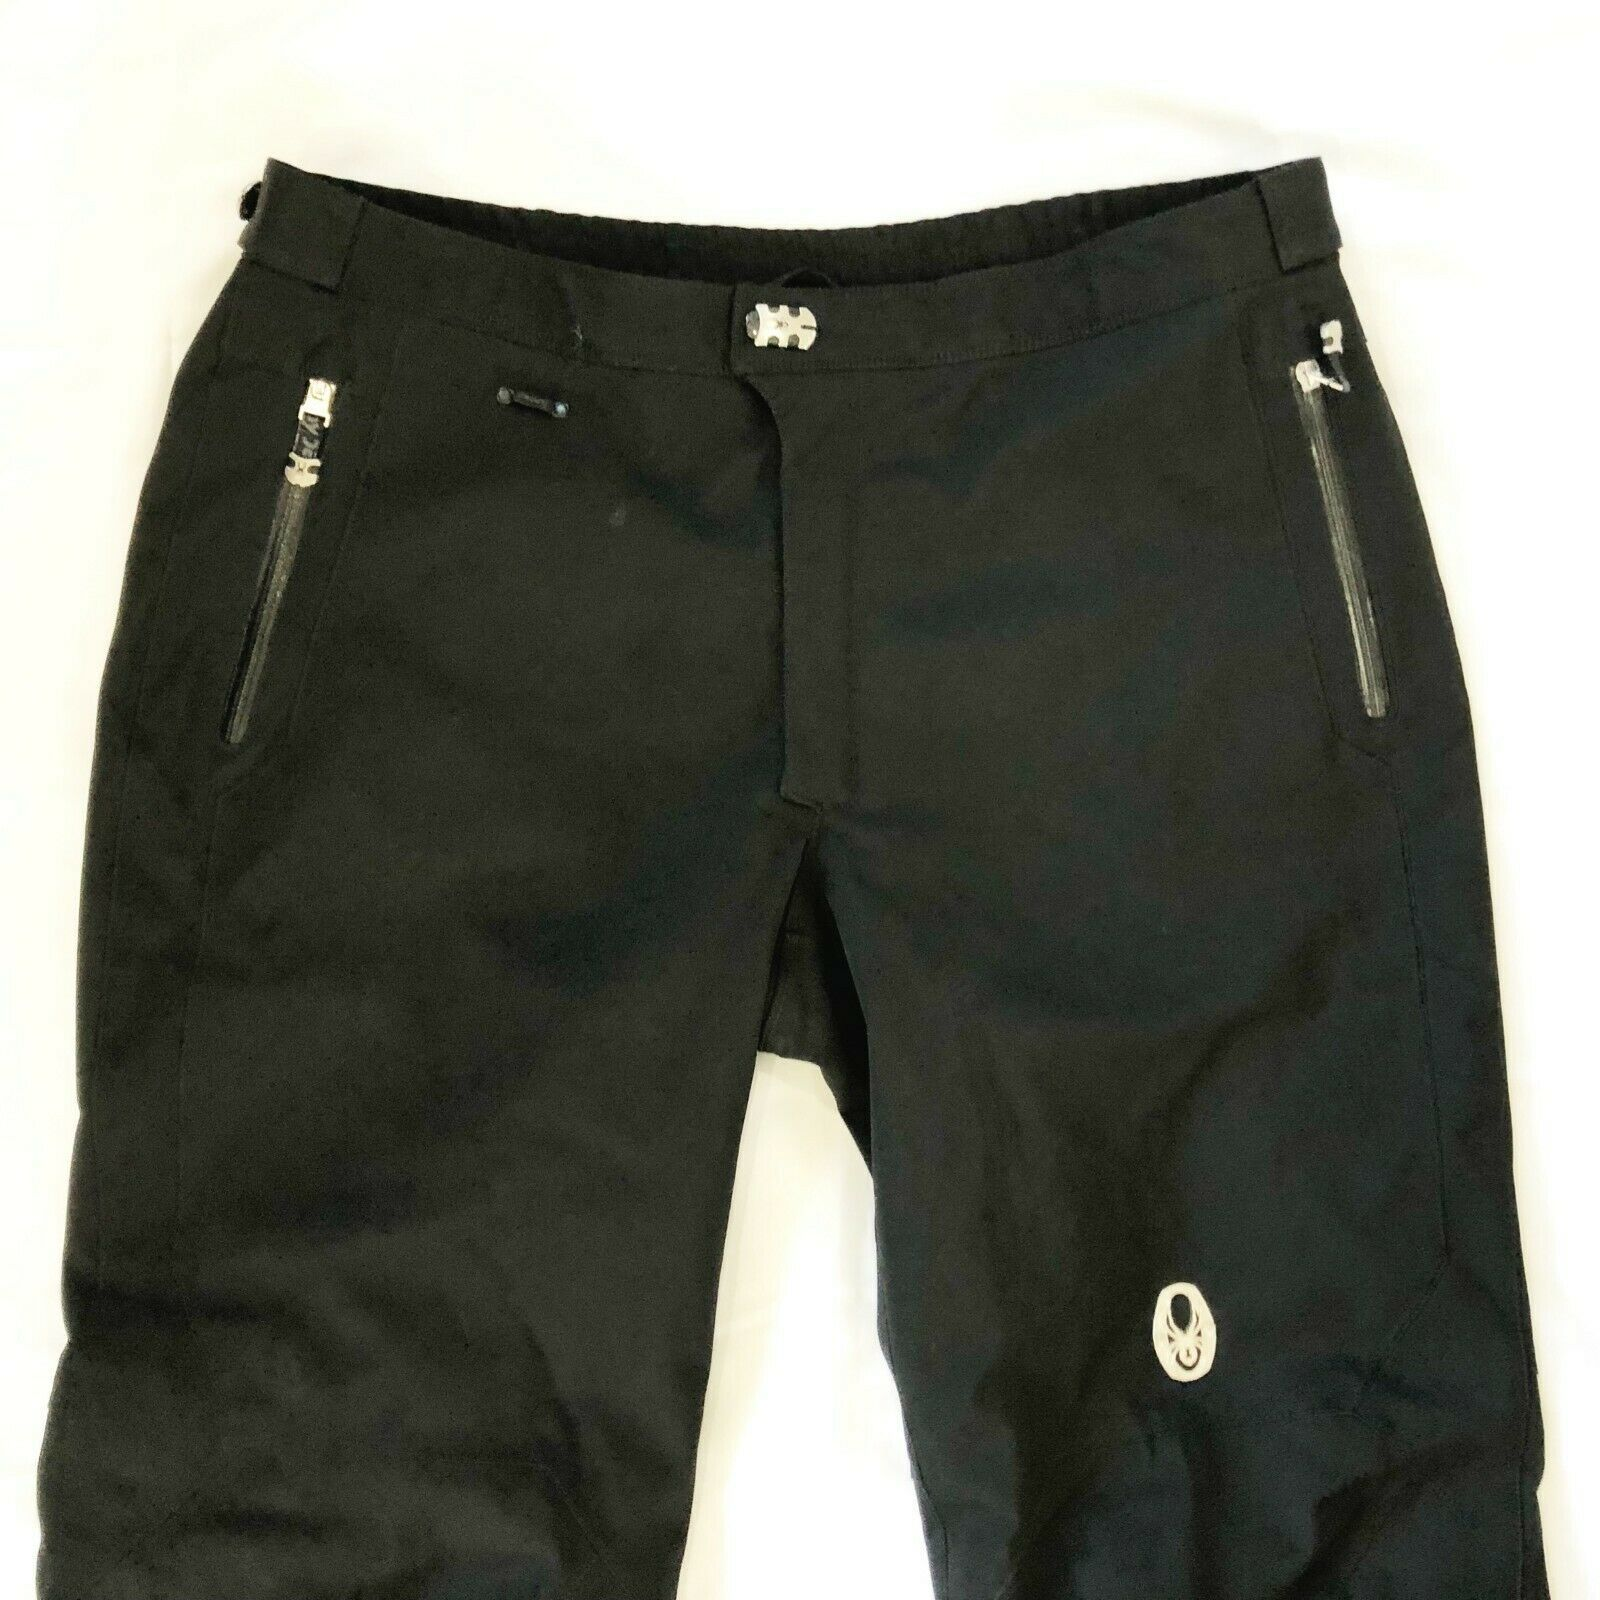 SPYDER Ski Snowpants Thinsulate XLT Pant Size XXL x 34 / 9326